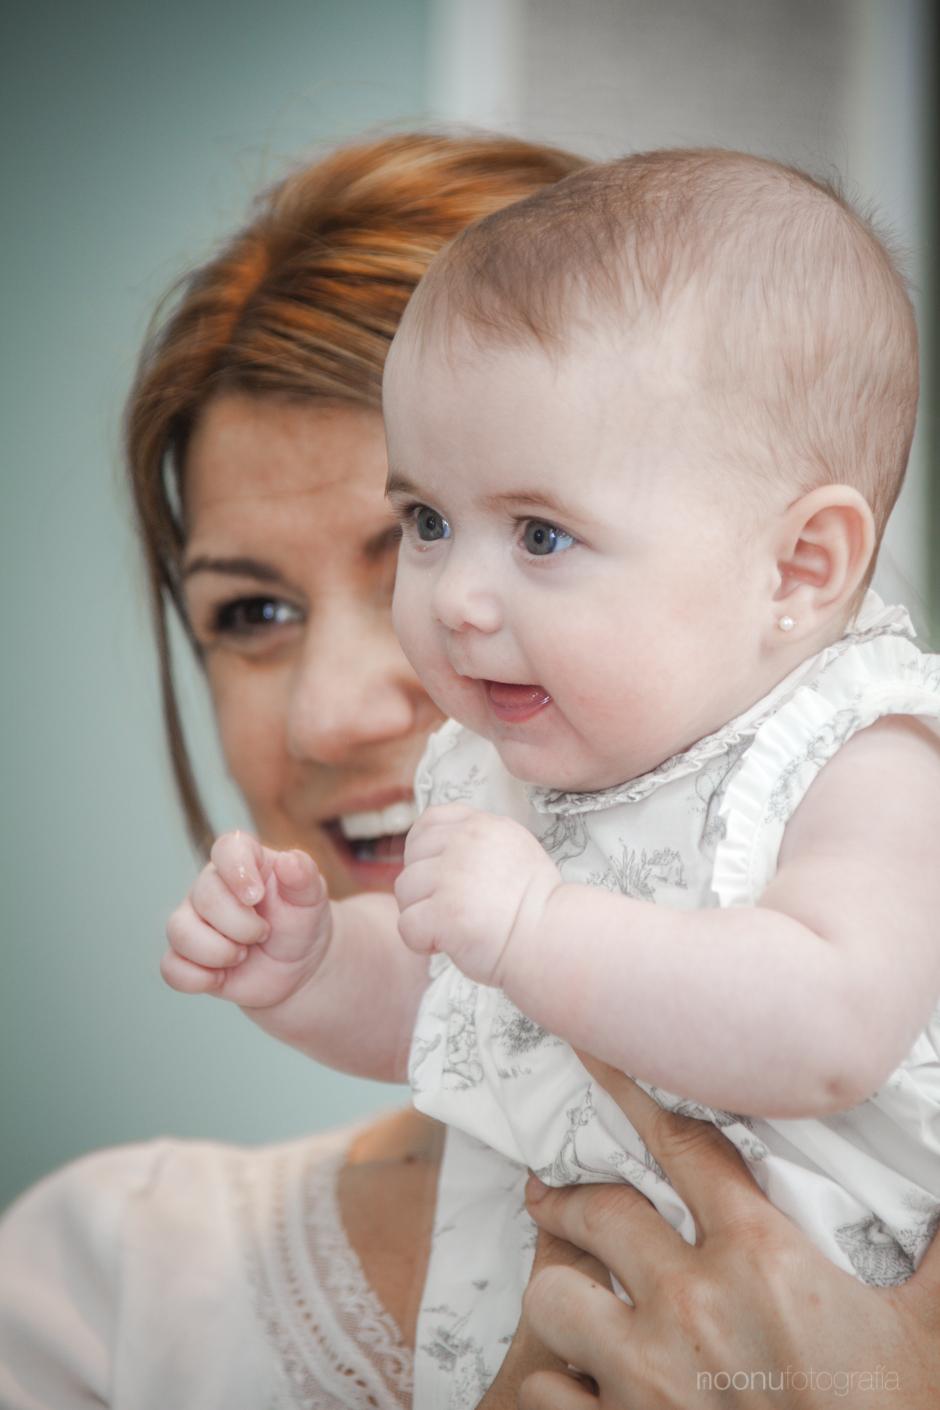 Noonu-fotografos-de-bebes-madrid-Greta 8-2